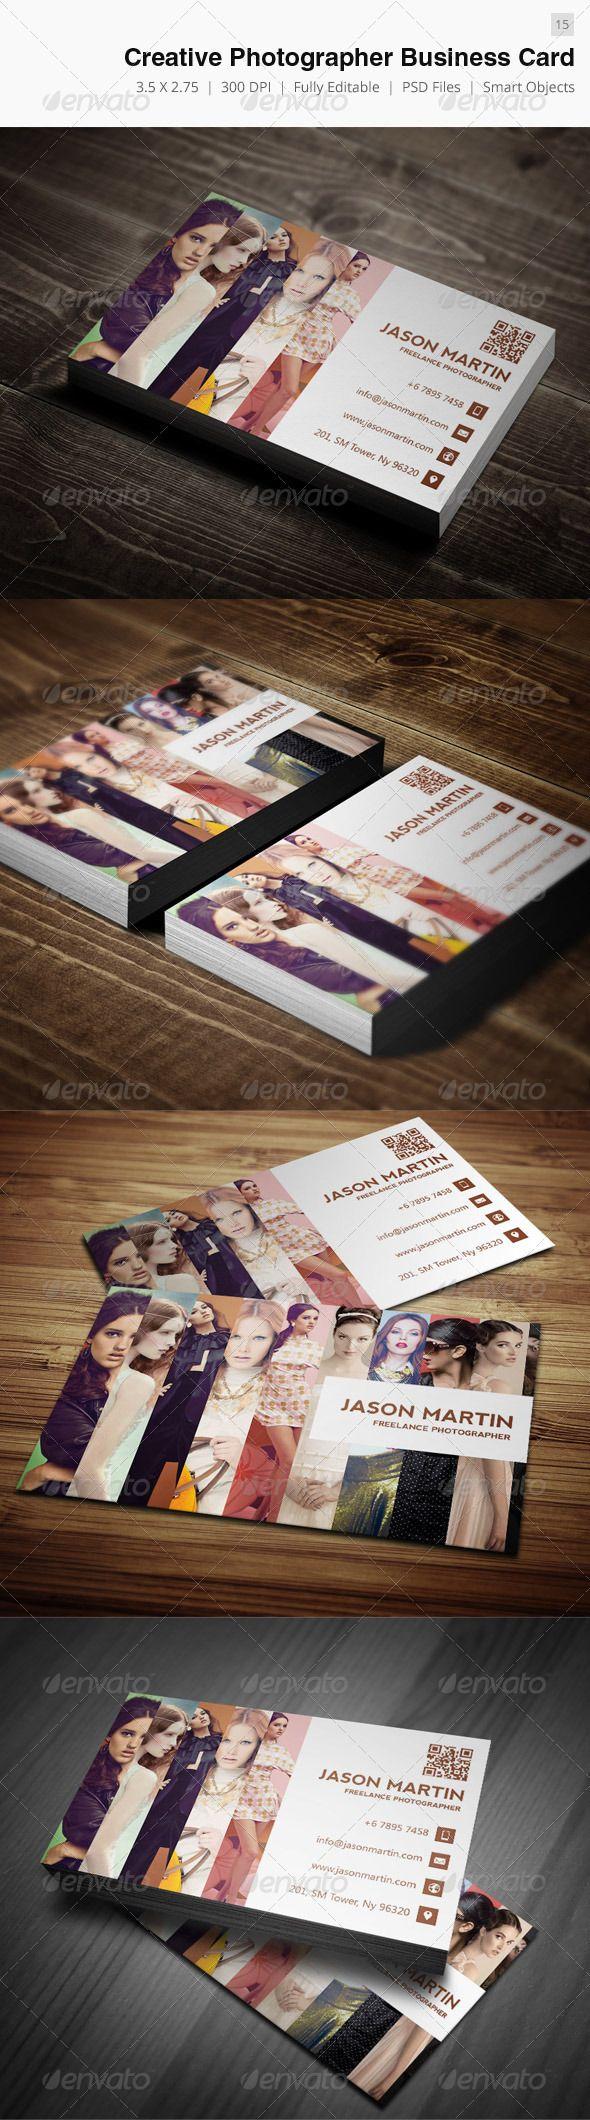 Creative Photographer Business Card - 15 - Creative Business Cards